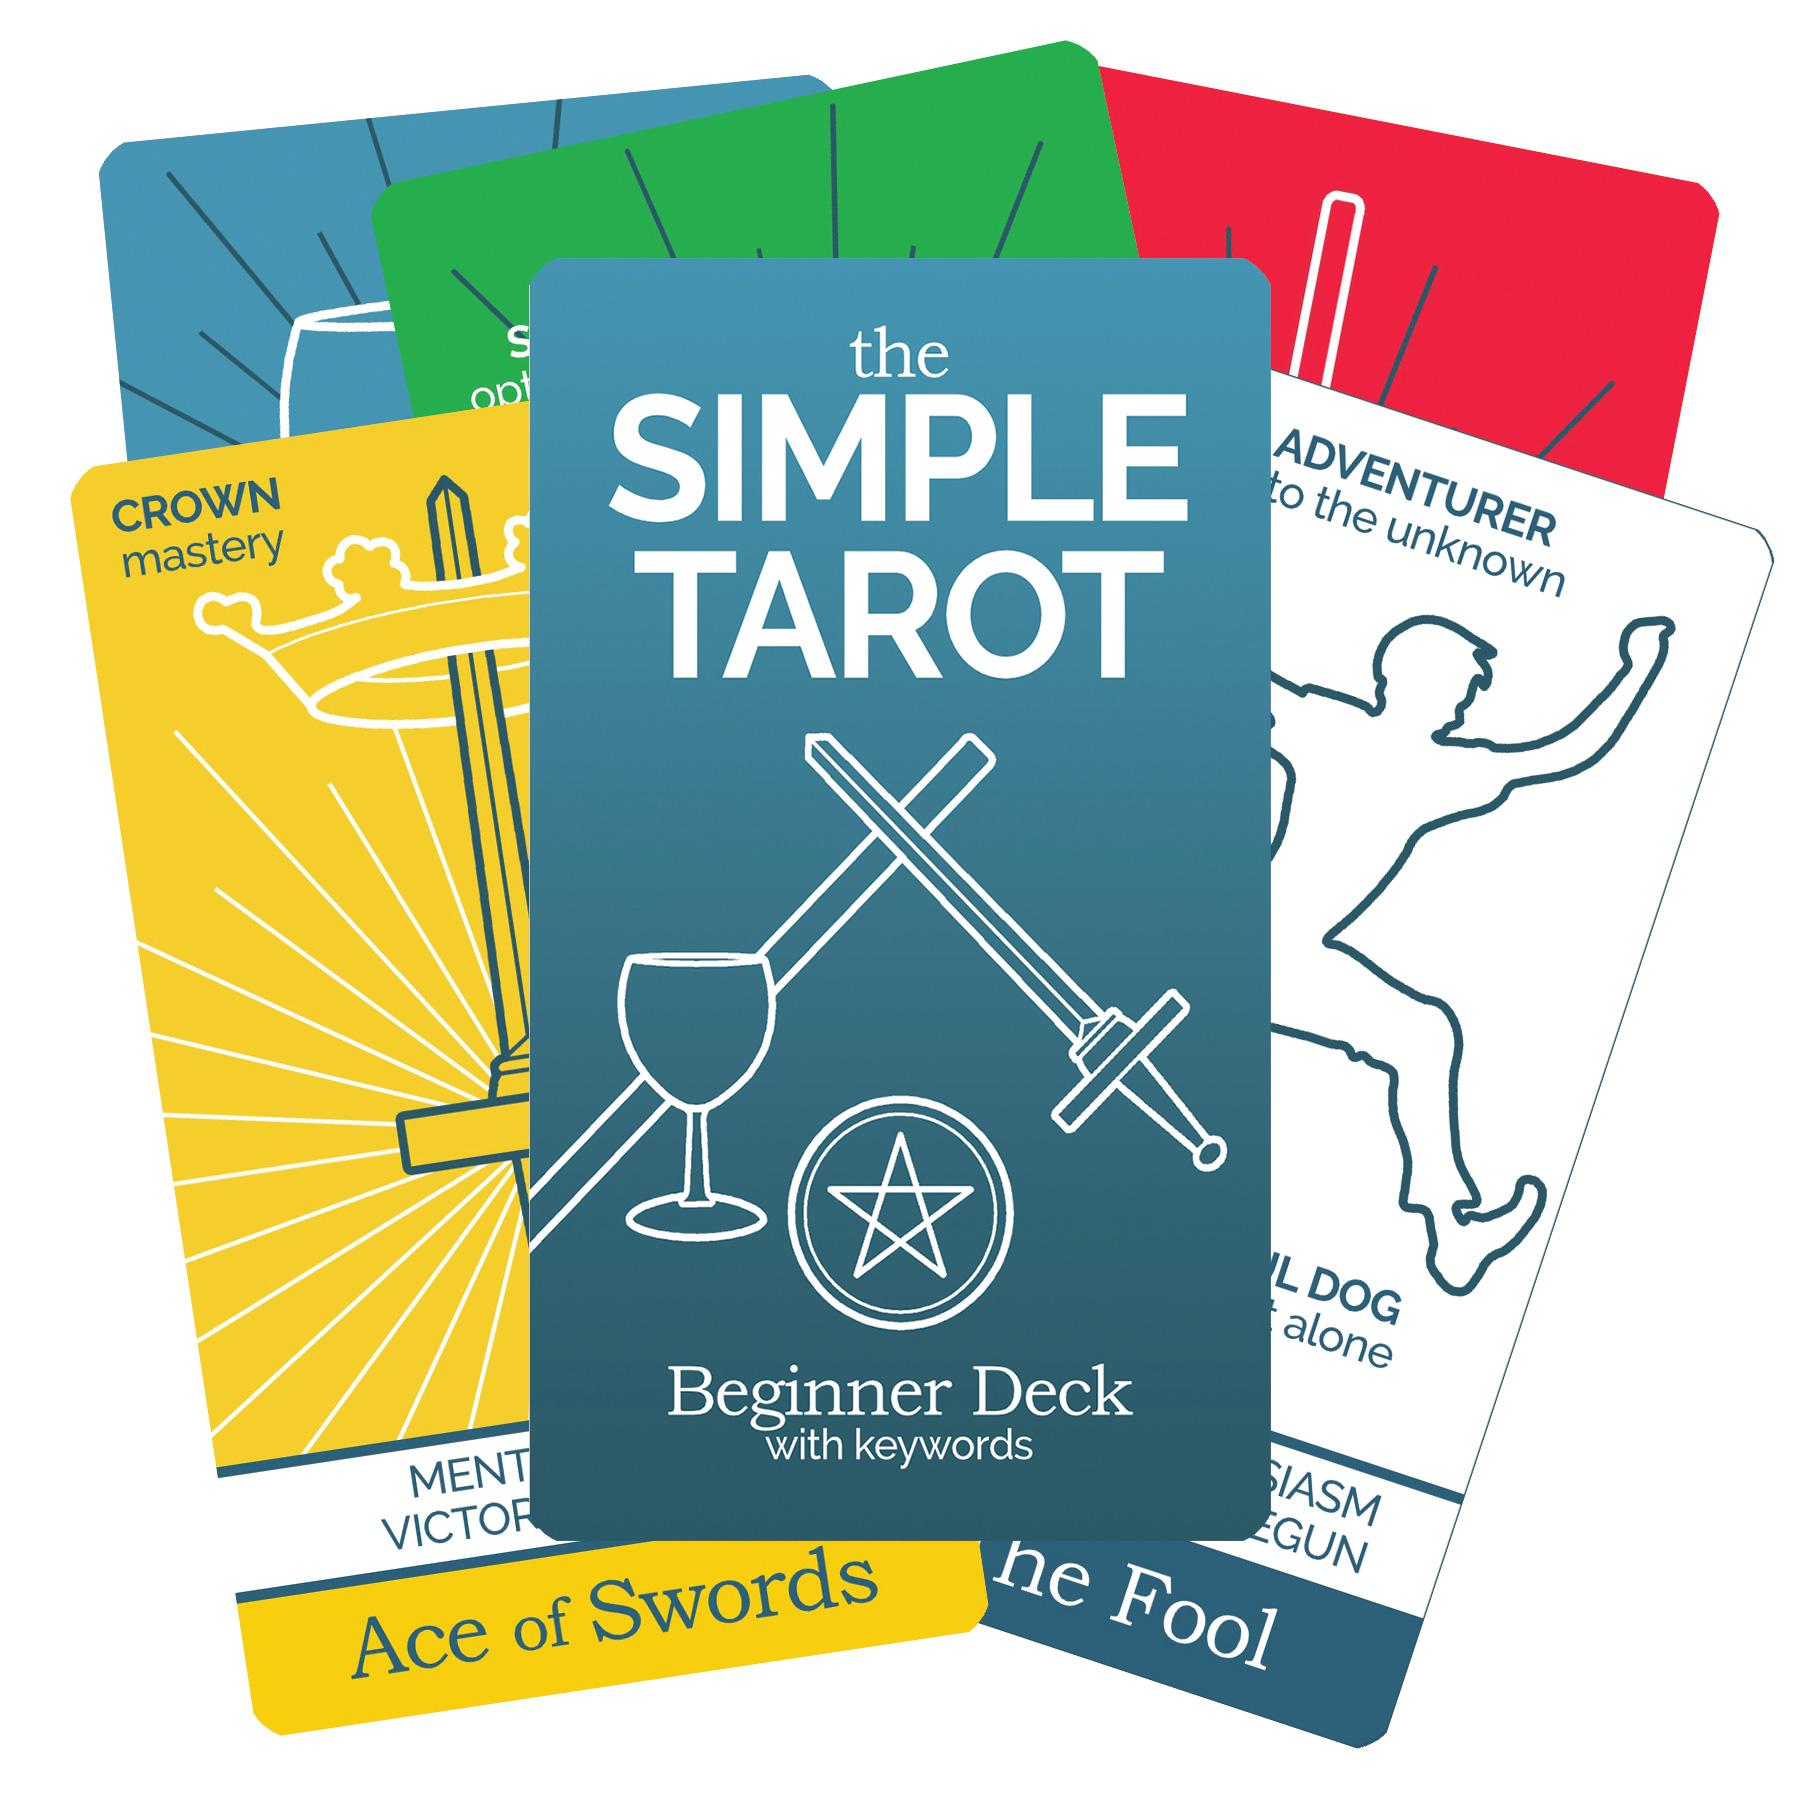 The Simple Tarot Deck Beginner Version with tarot keywords.